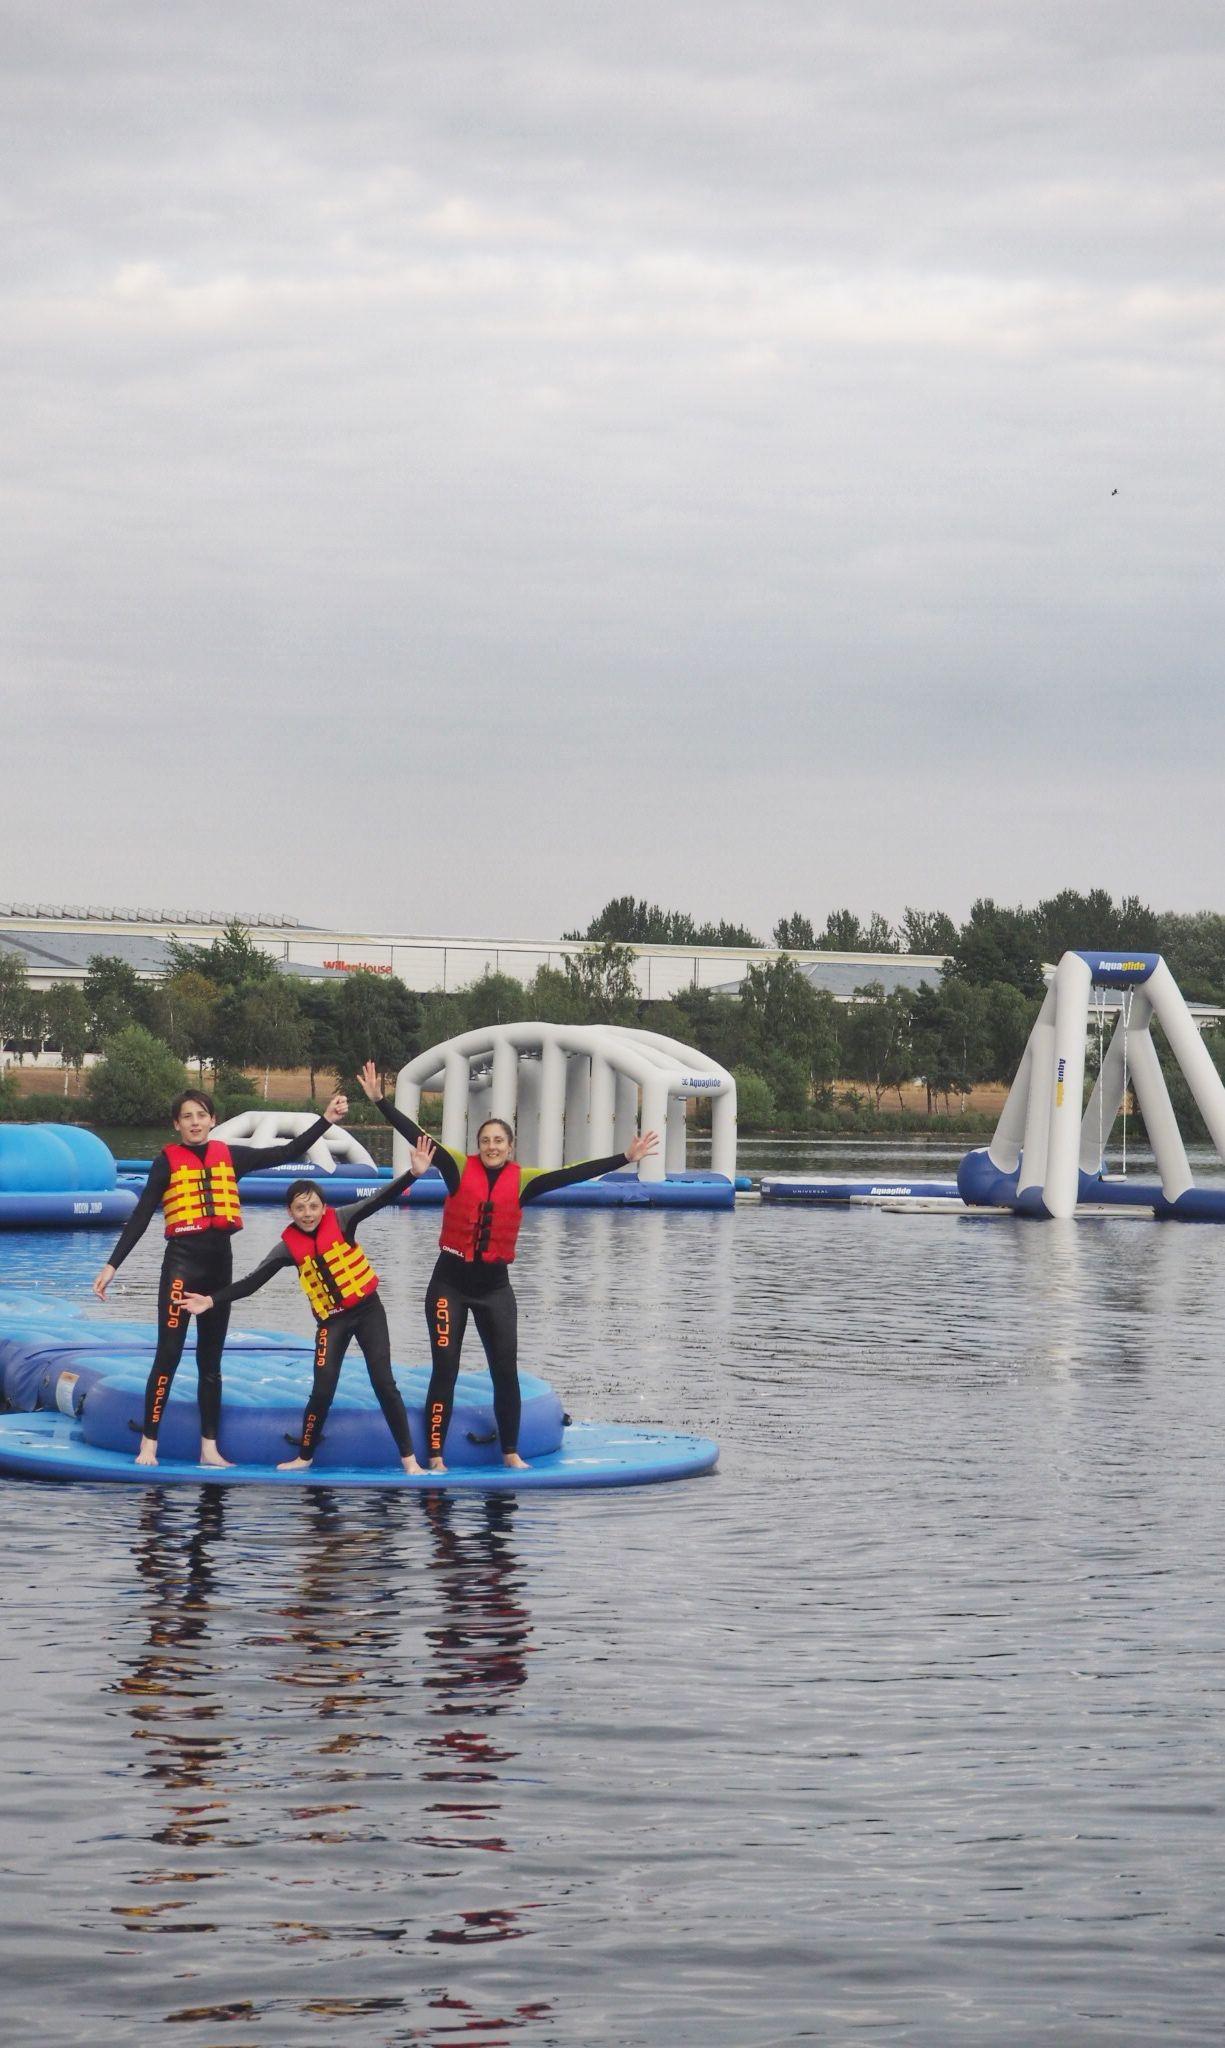 hands-up-if-you-love-Aqua-Parcs-inflatable-assualt-course-Willen-Lake-Milton-Keynes